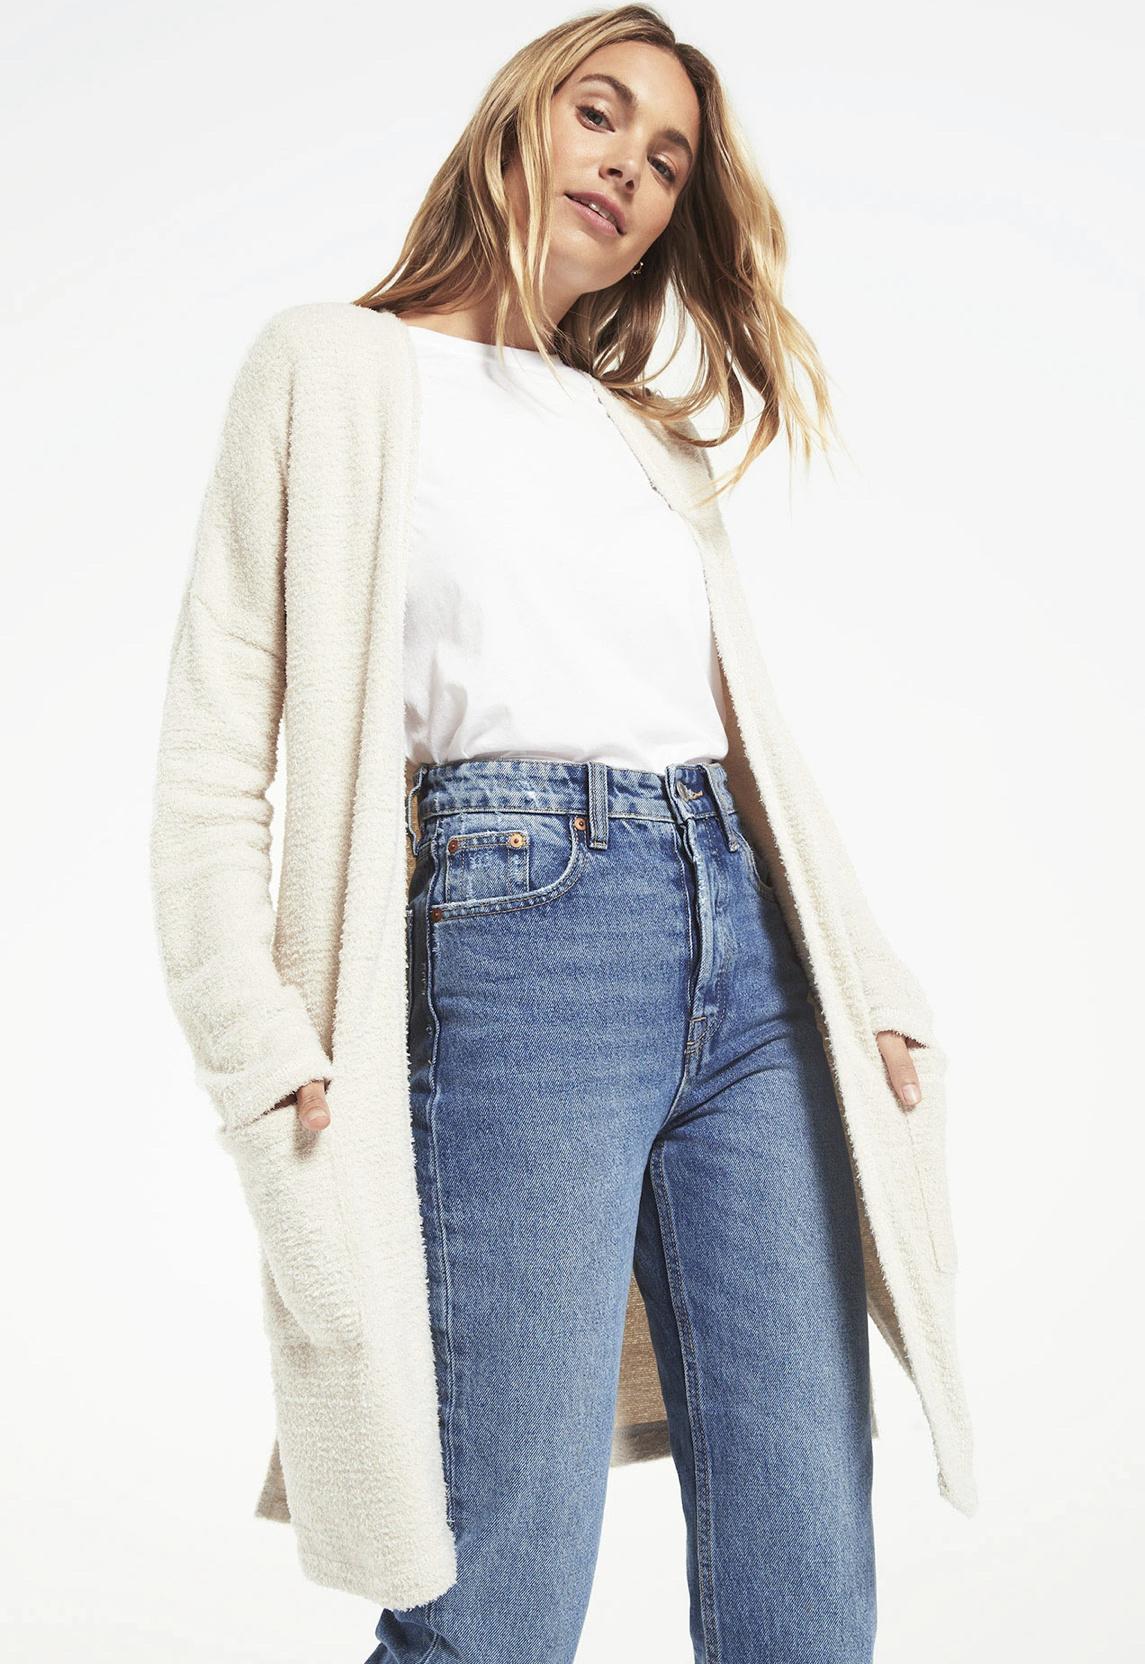 Z Supply Remi Feather Knit Cardi - Ivory